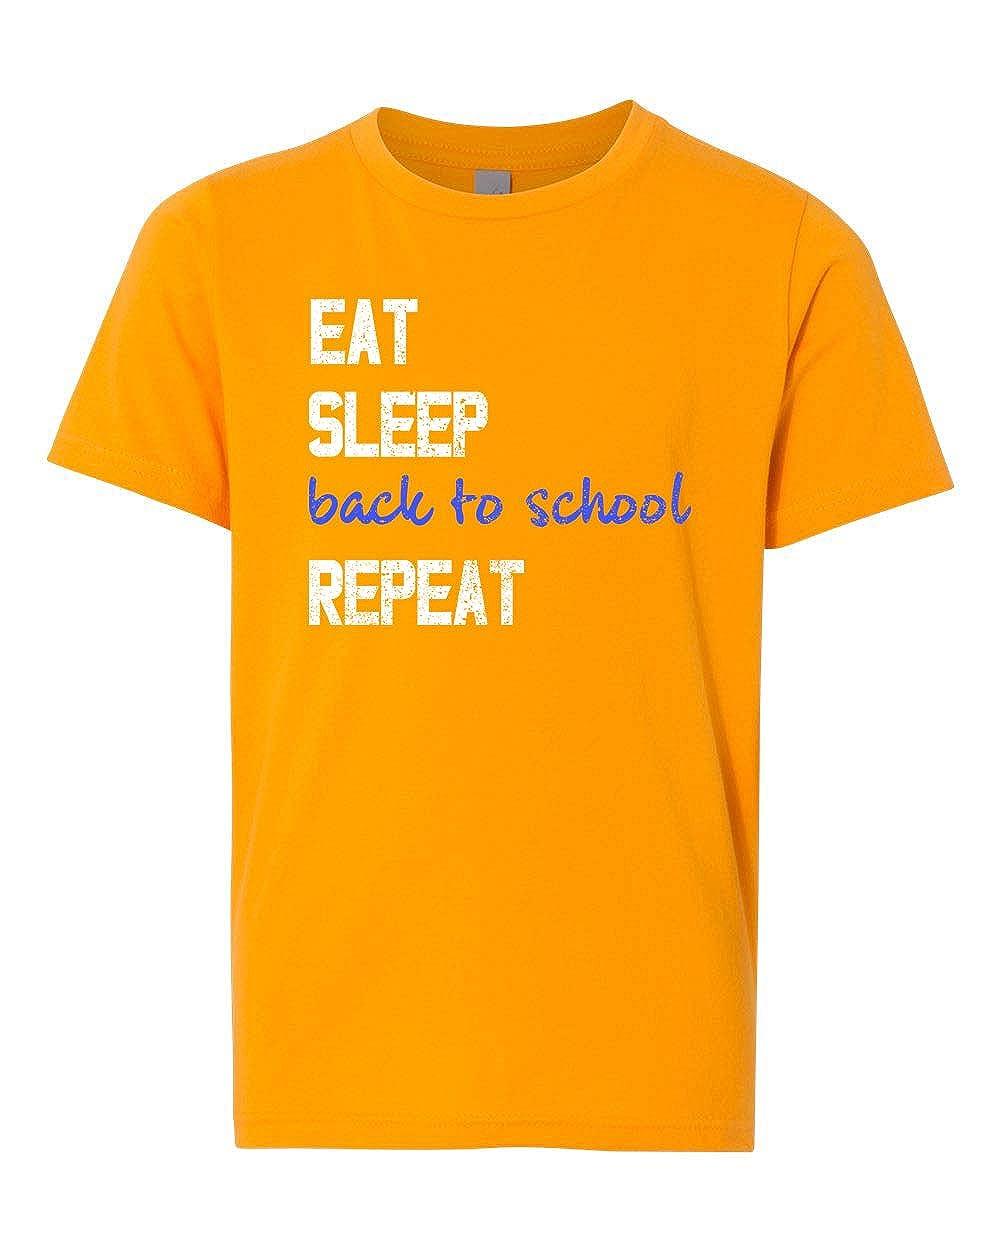 Custom Apparel R Us Eat Sleep School Repeat Boys Girls Graphic Tees Short Sleeve